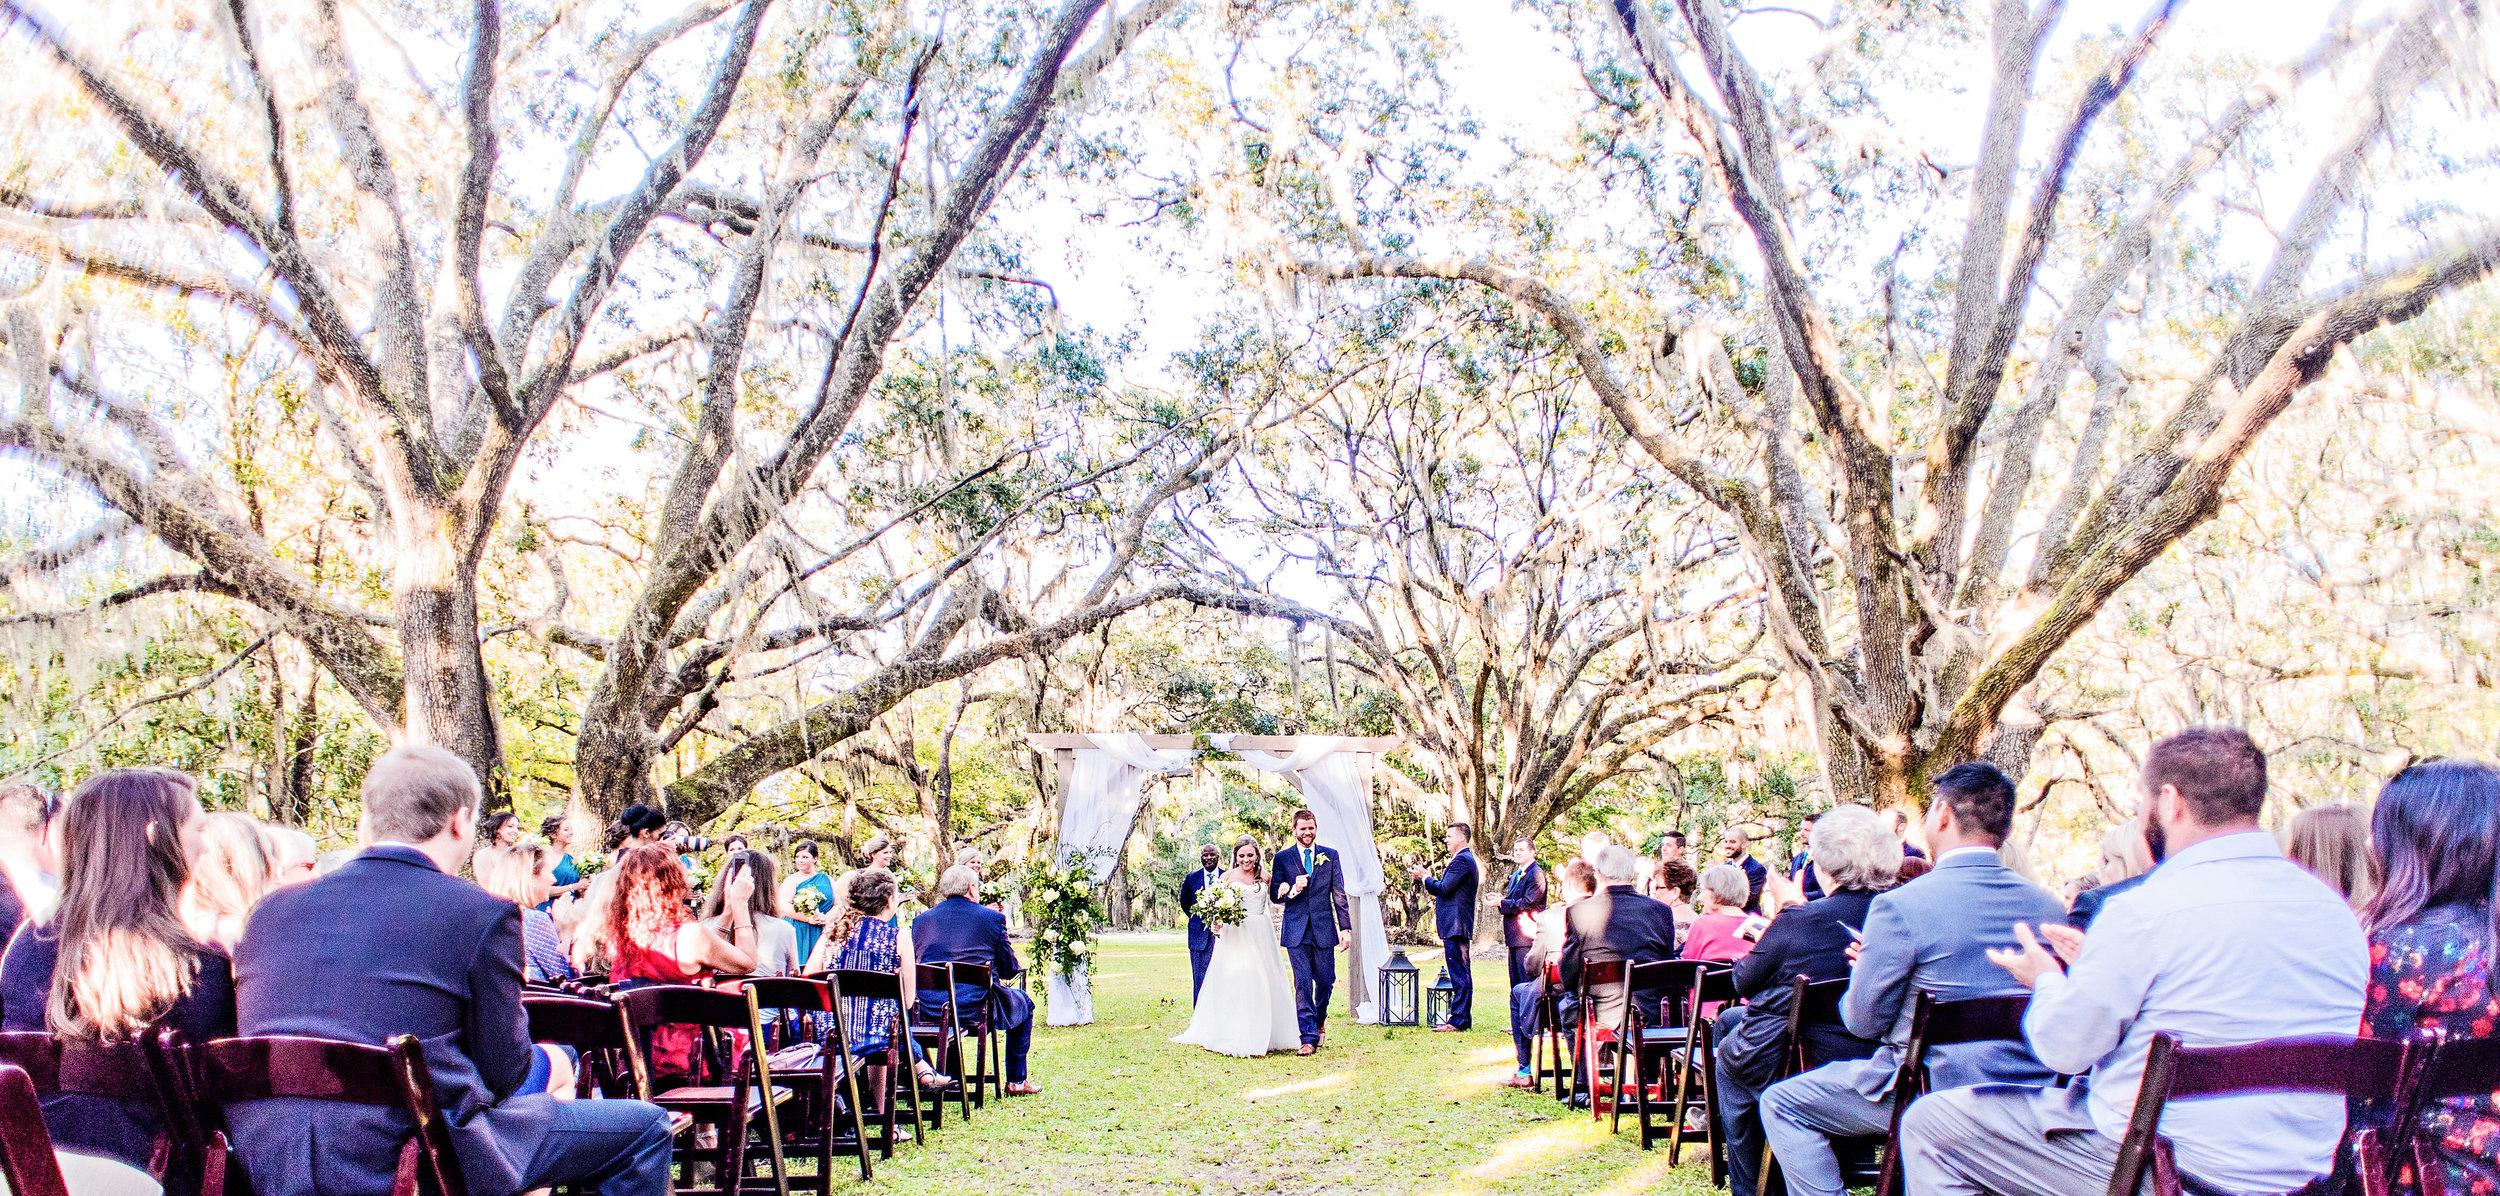 Teal wedding at Litchfield Plantation by Corina Silva